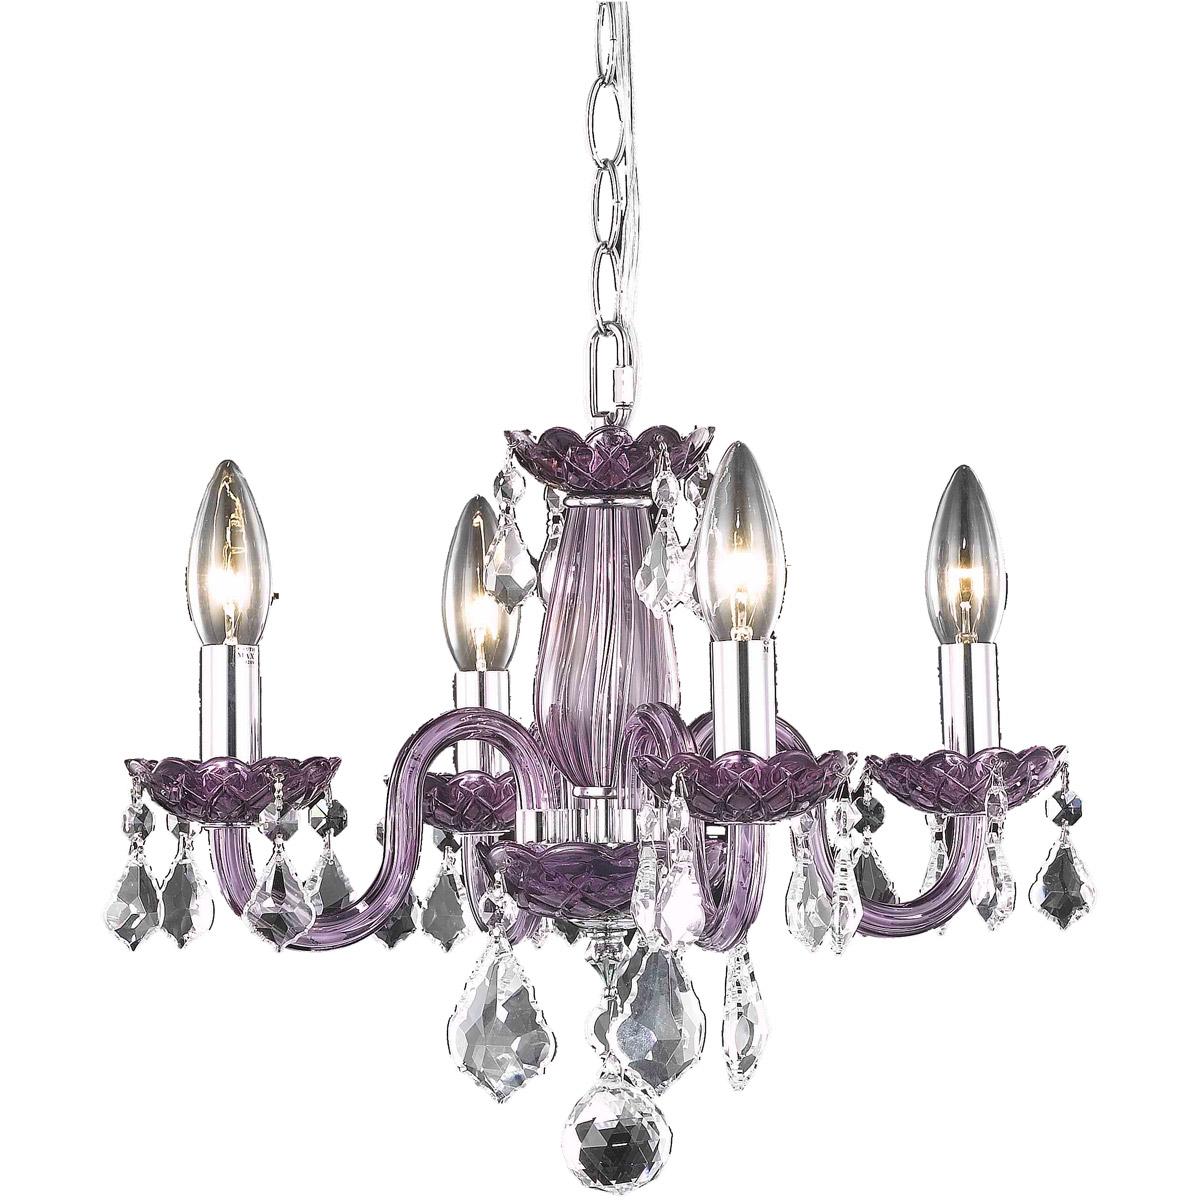 4 light venetian purple crystal chandelier bedroom bathroom dining 4 light beautiful purple crystal chandelier in the venetian style h 12 x w 15 arubaitofo Image collections